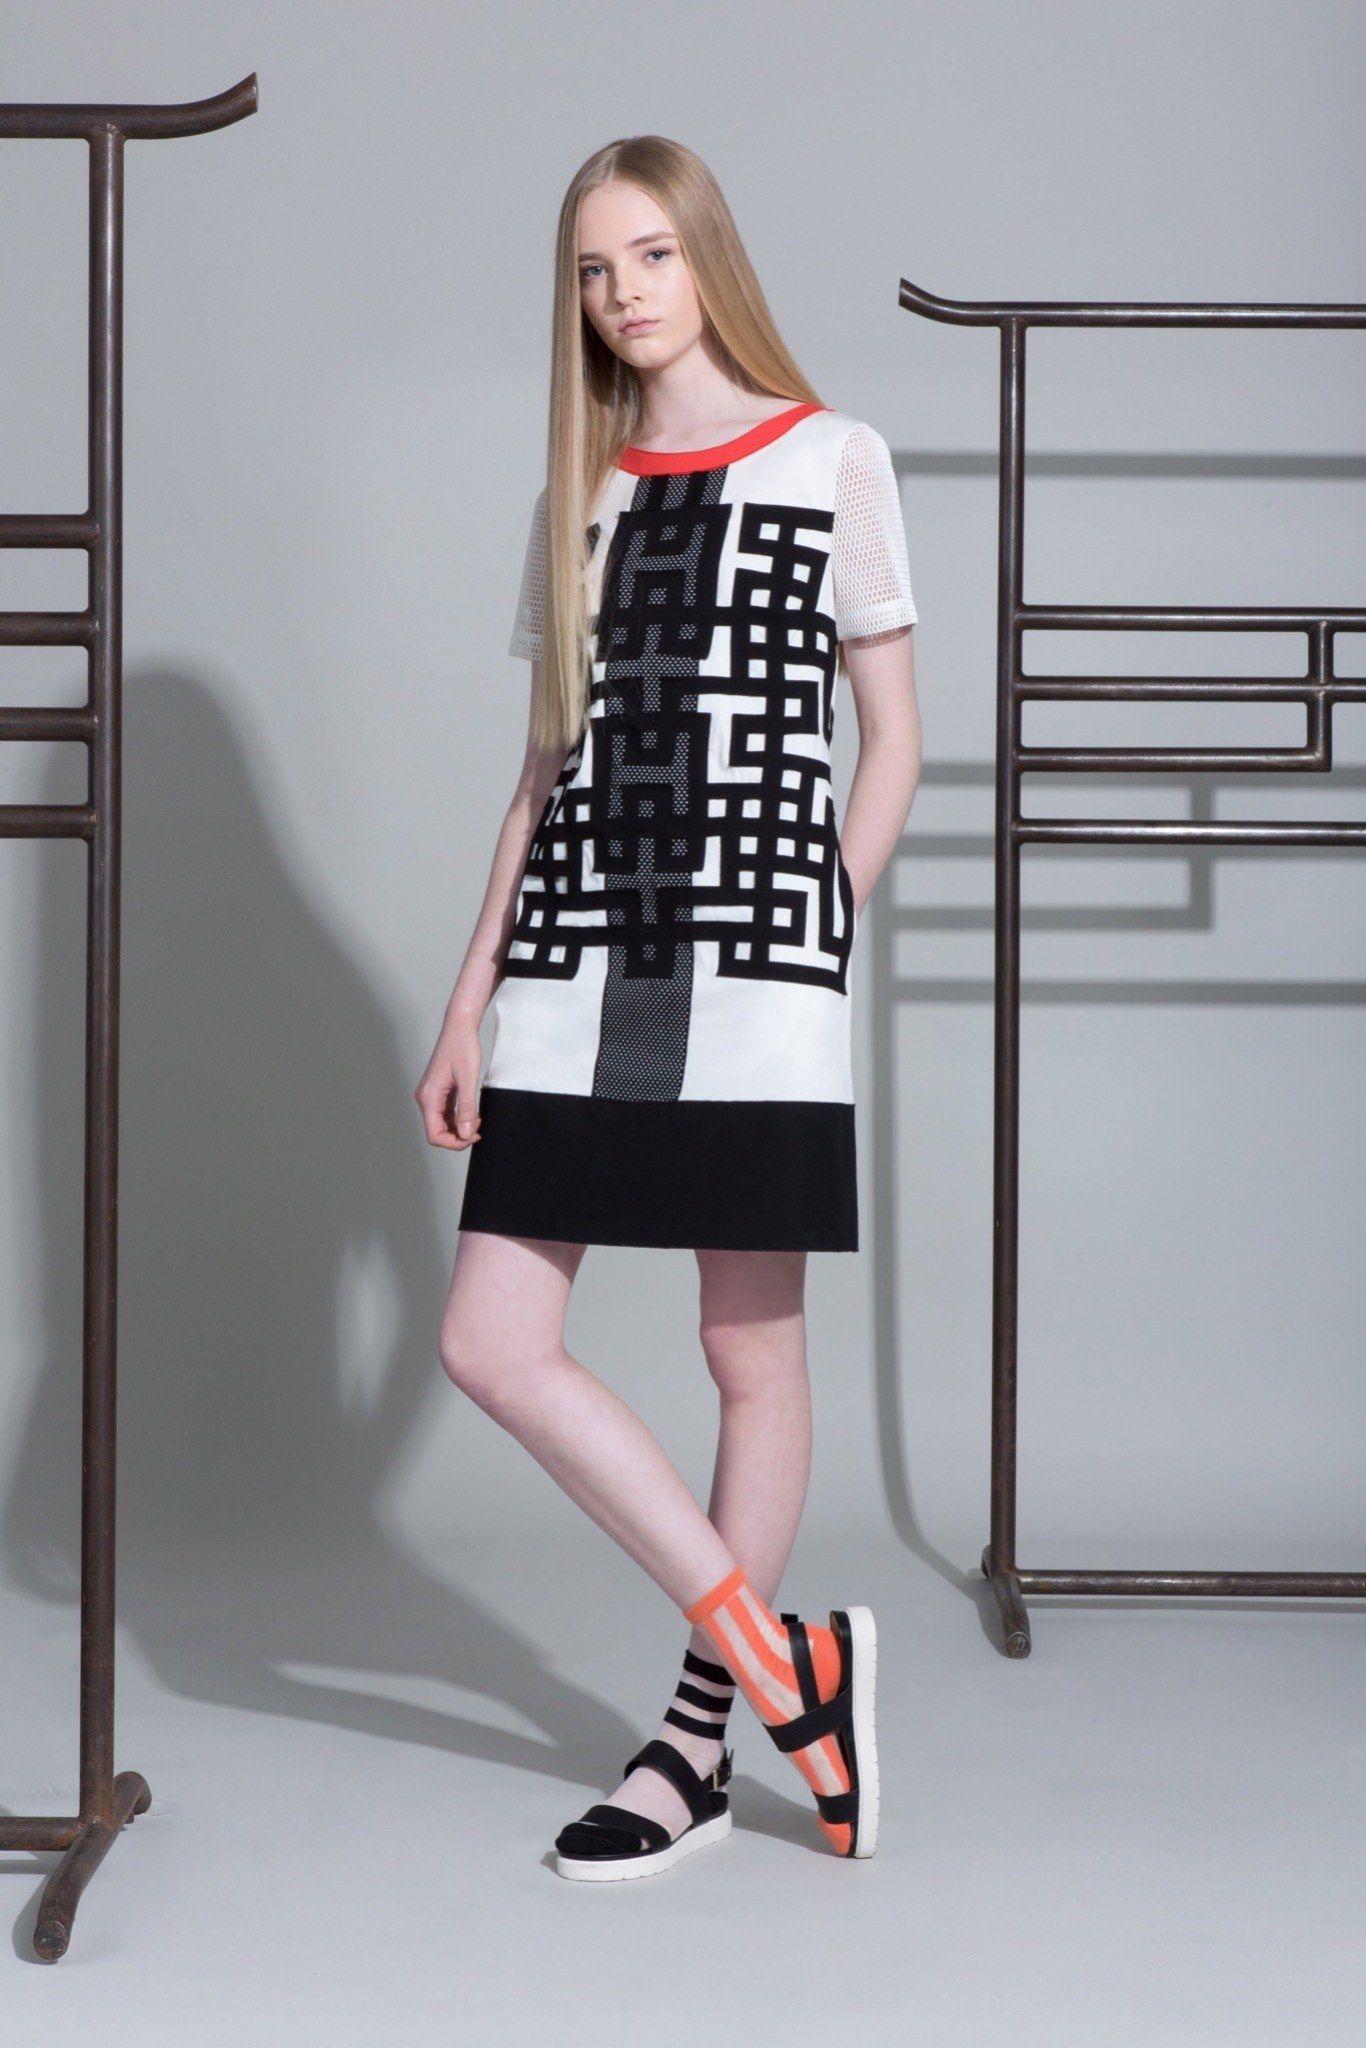 Vivienne Tam Resort 2016 Fashion Show